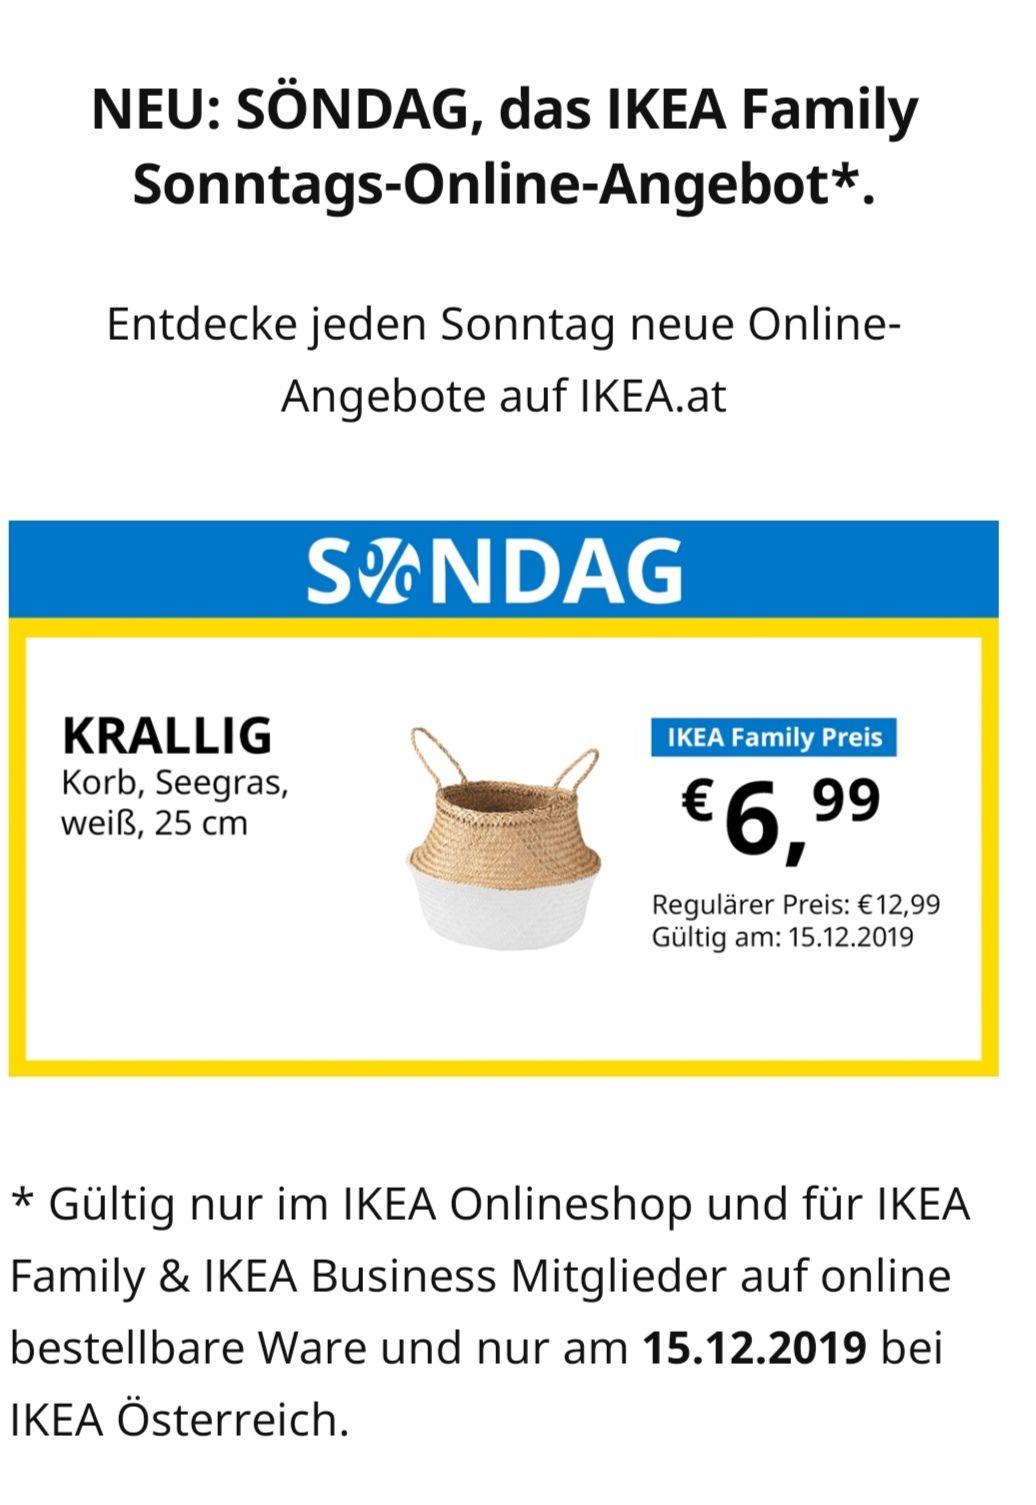 SONDAG Angebote bei Ikea